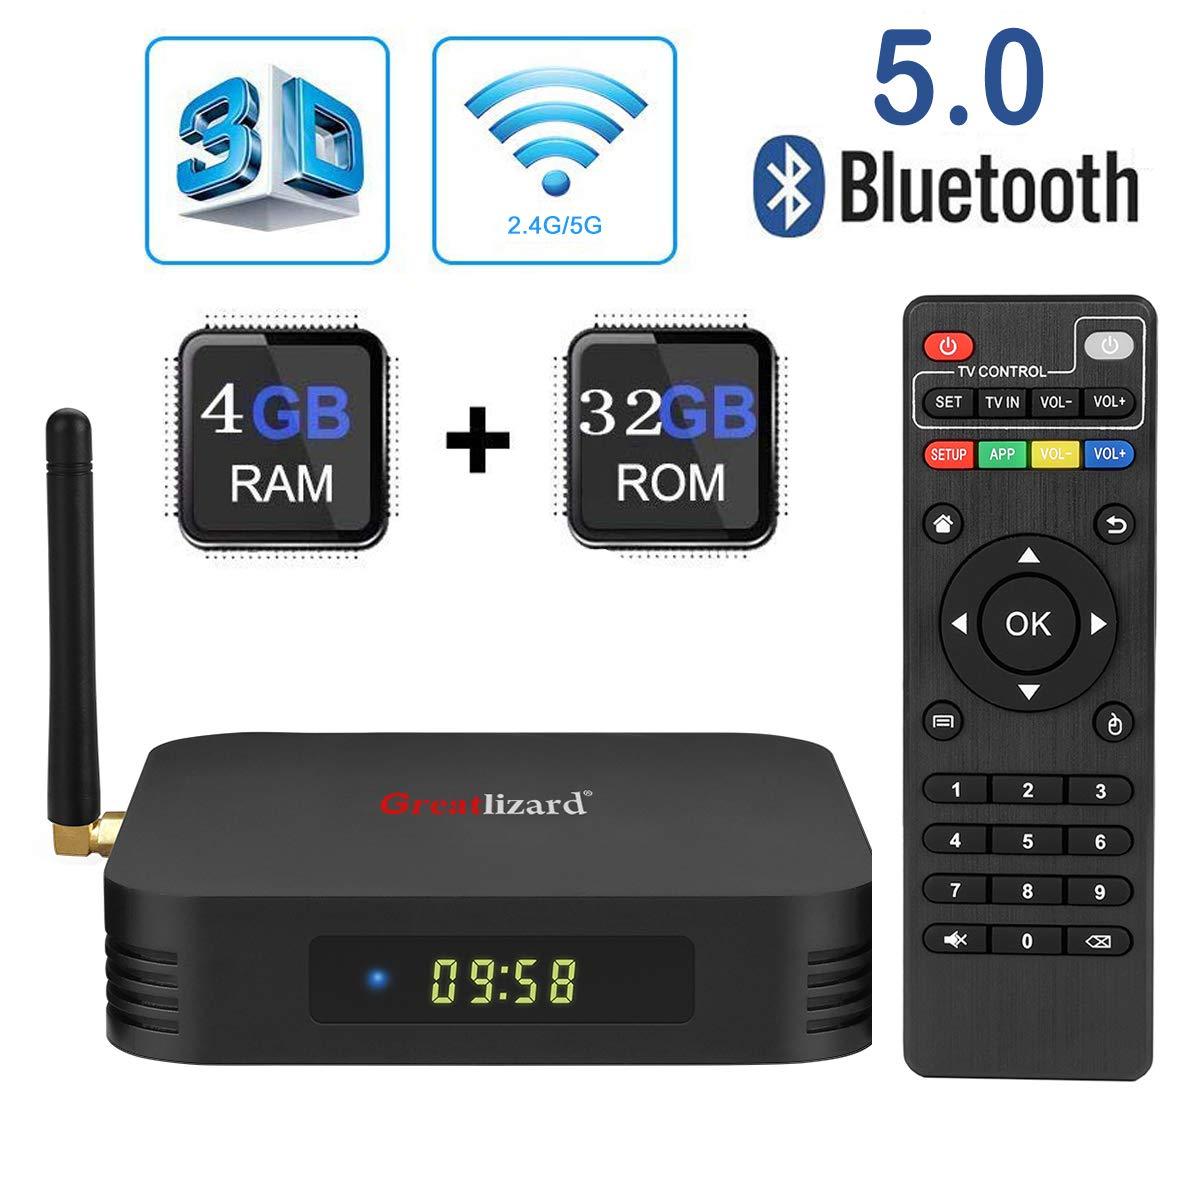 Android 9 0 TV Box,Greatlizard TX6 Android Box 4GB DDR3 32GB ROM BT5 0 Dual  WiFi 2 4G+5G Quad Core 1080p 4K 6K USB 3 0 HDR Smart TV Media Box